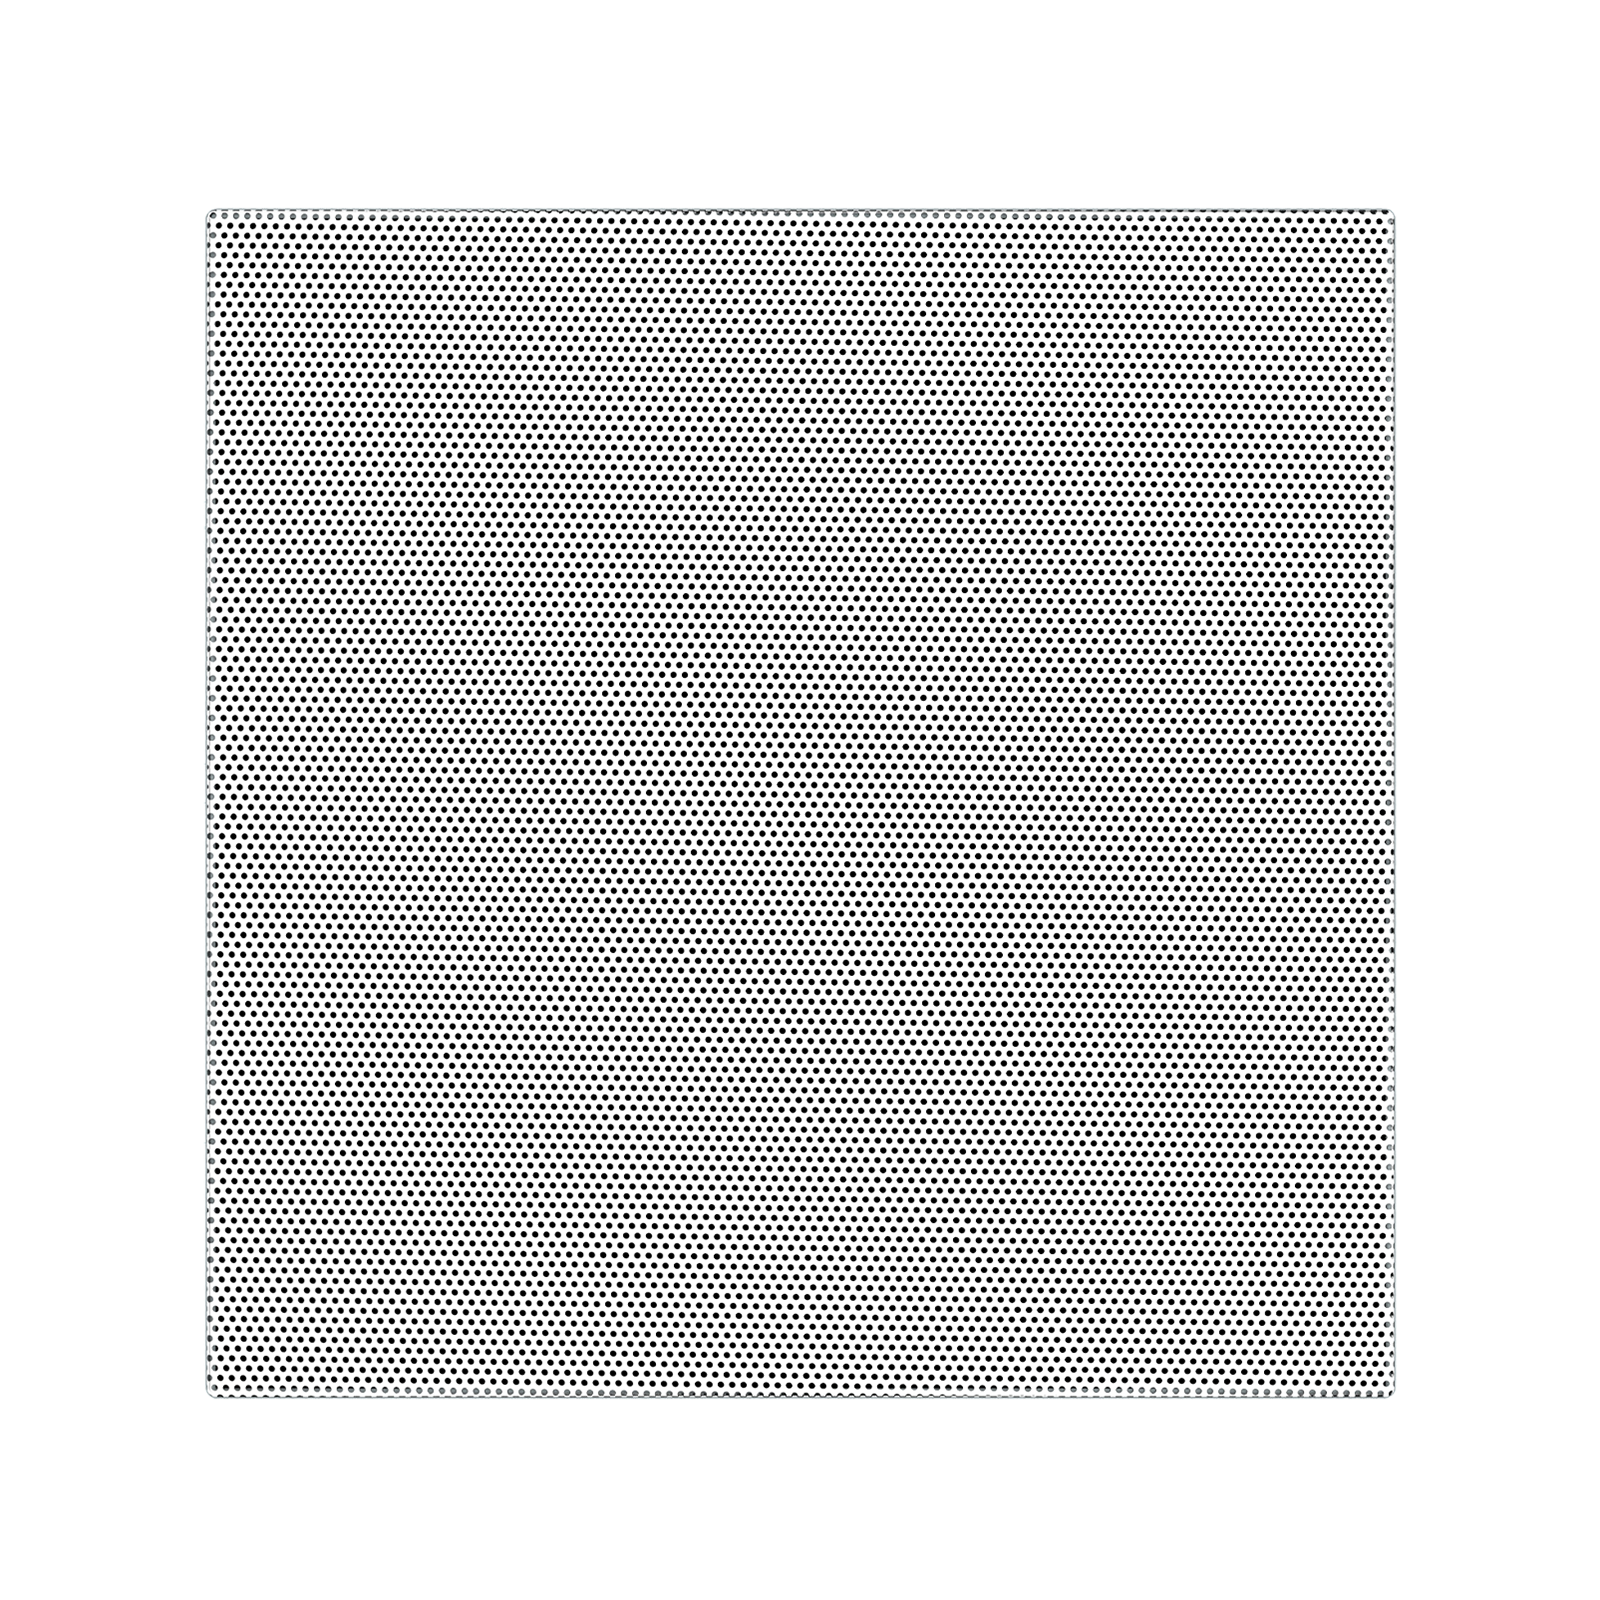 SCL-8 - Black - 2-Way 5.25-inch (130mm) In-Ceiling Loudspeaker - Detailshot 4